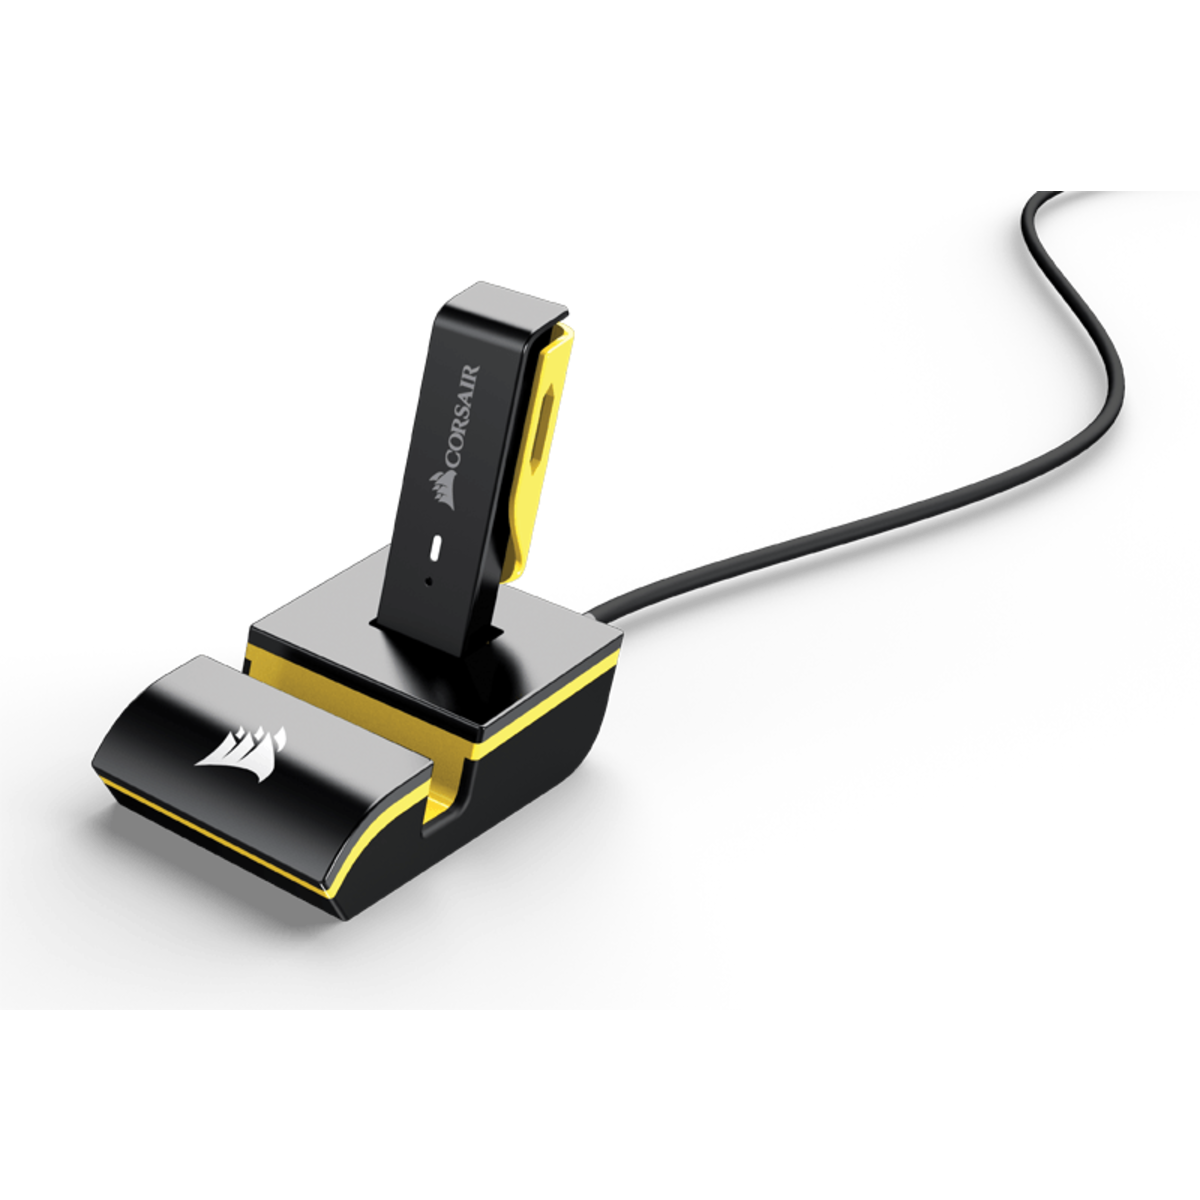 『VOID PRO RGB Wireless SE』の「USB Receiver Dock」